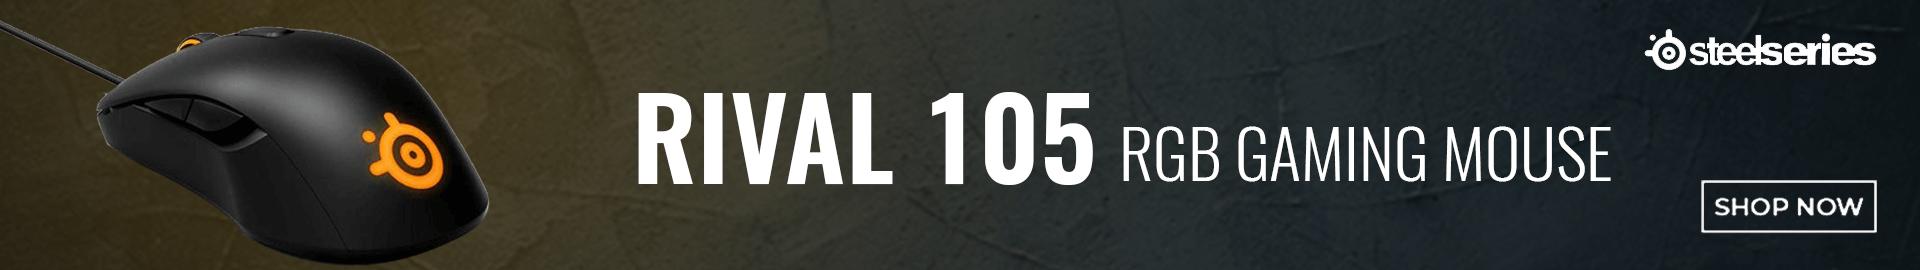 SteelSeries Rival 105 RGB